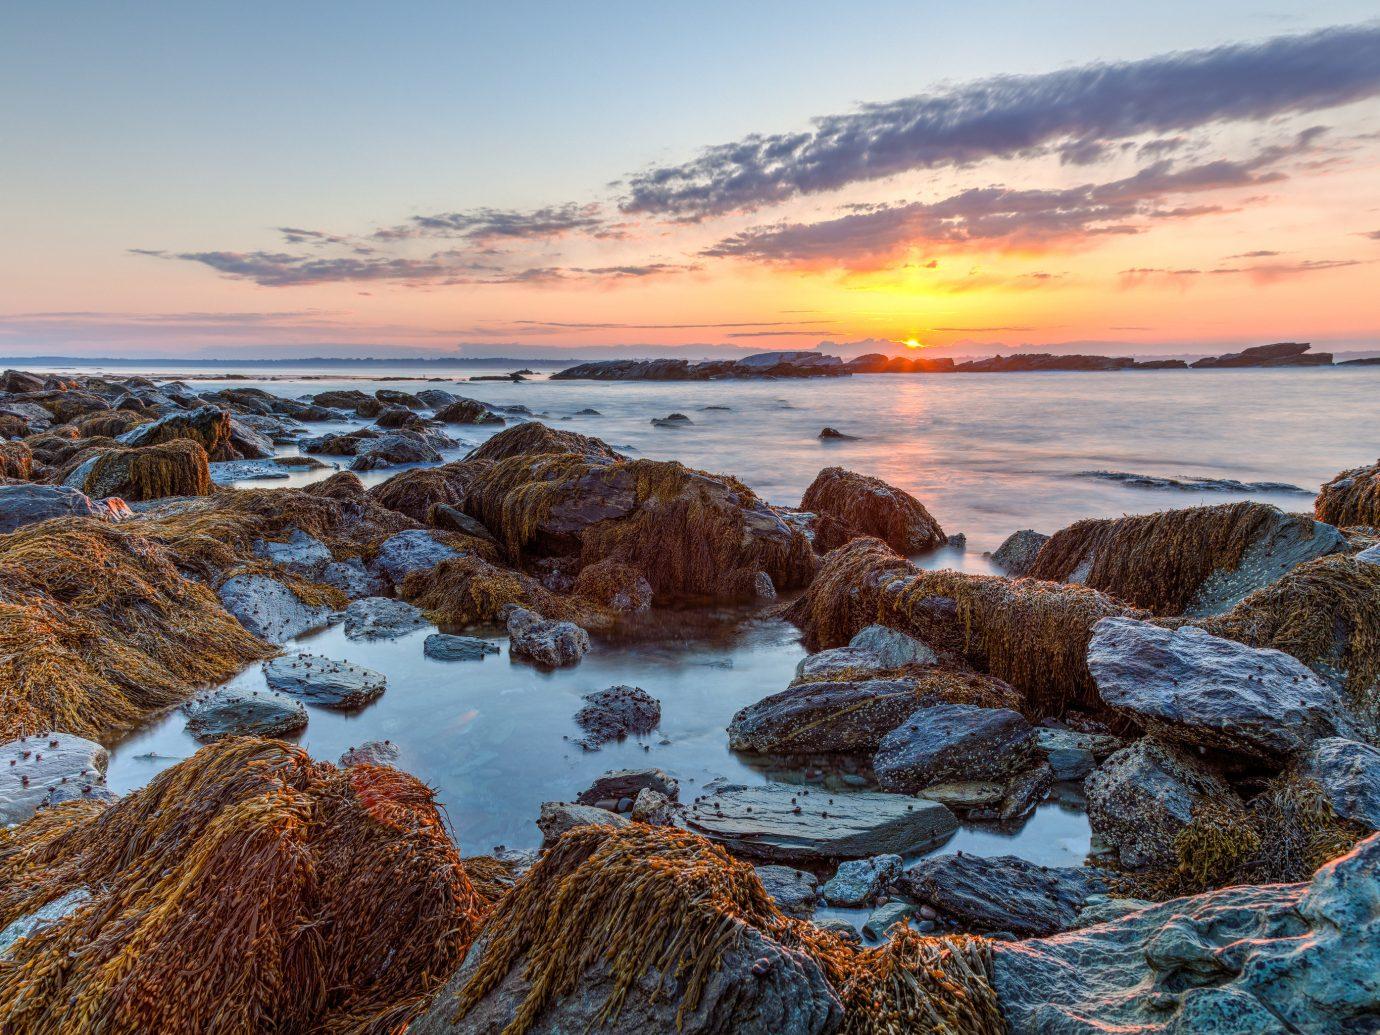 outdoor sky shore Coast Sea Ocean body of water rock sunrise Beach Nature Sunset horizon wave cloud wind wave morning dawn rocky landscape evening dusk bay material sand cape